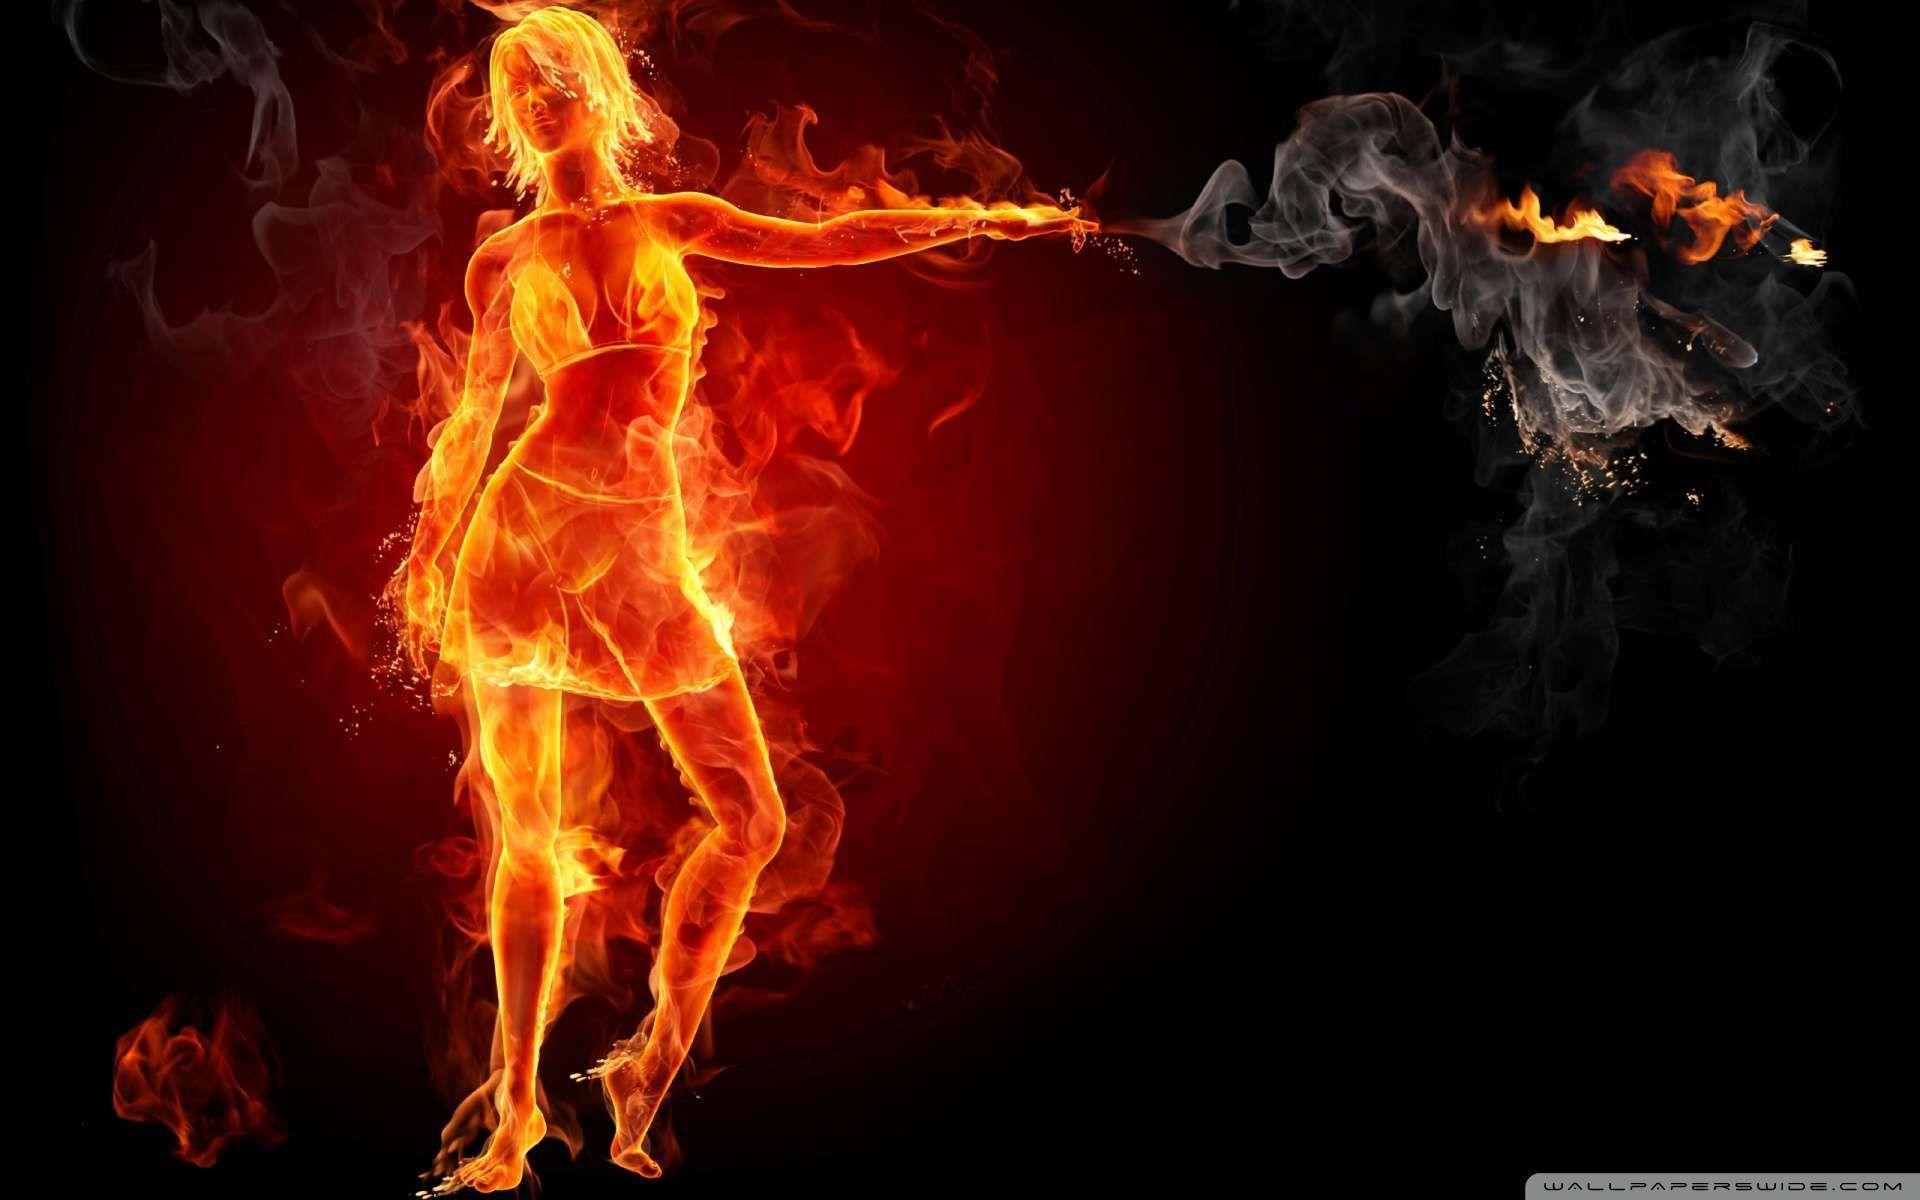 http://www.hdwallwide/wp-content/uploads/2014/01/hot-girl-on